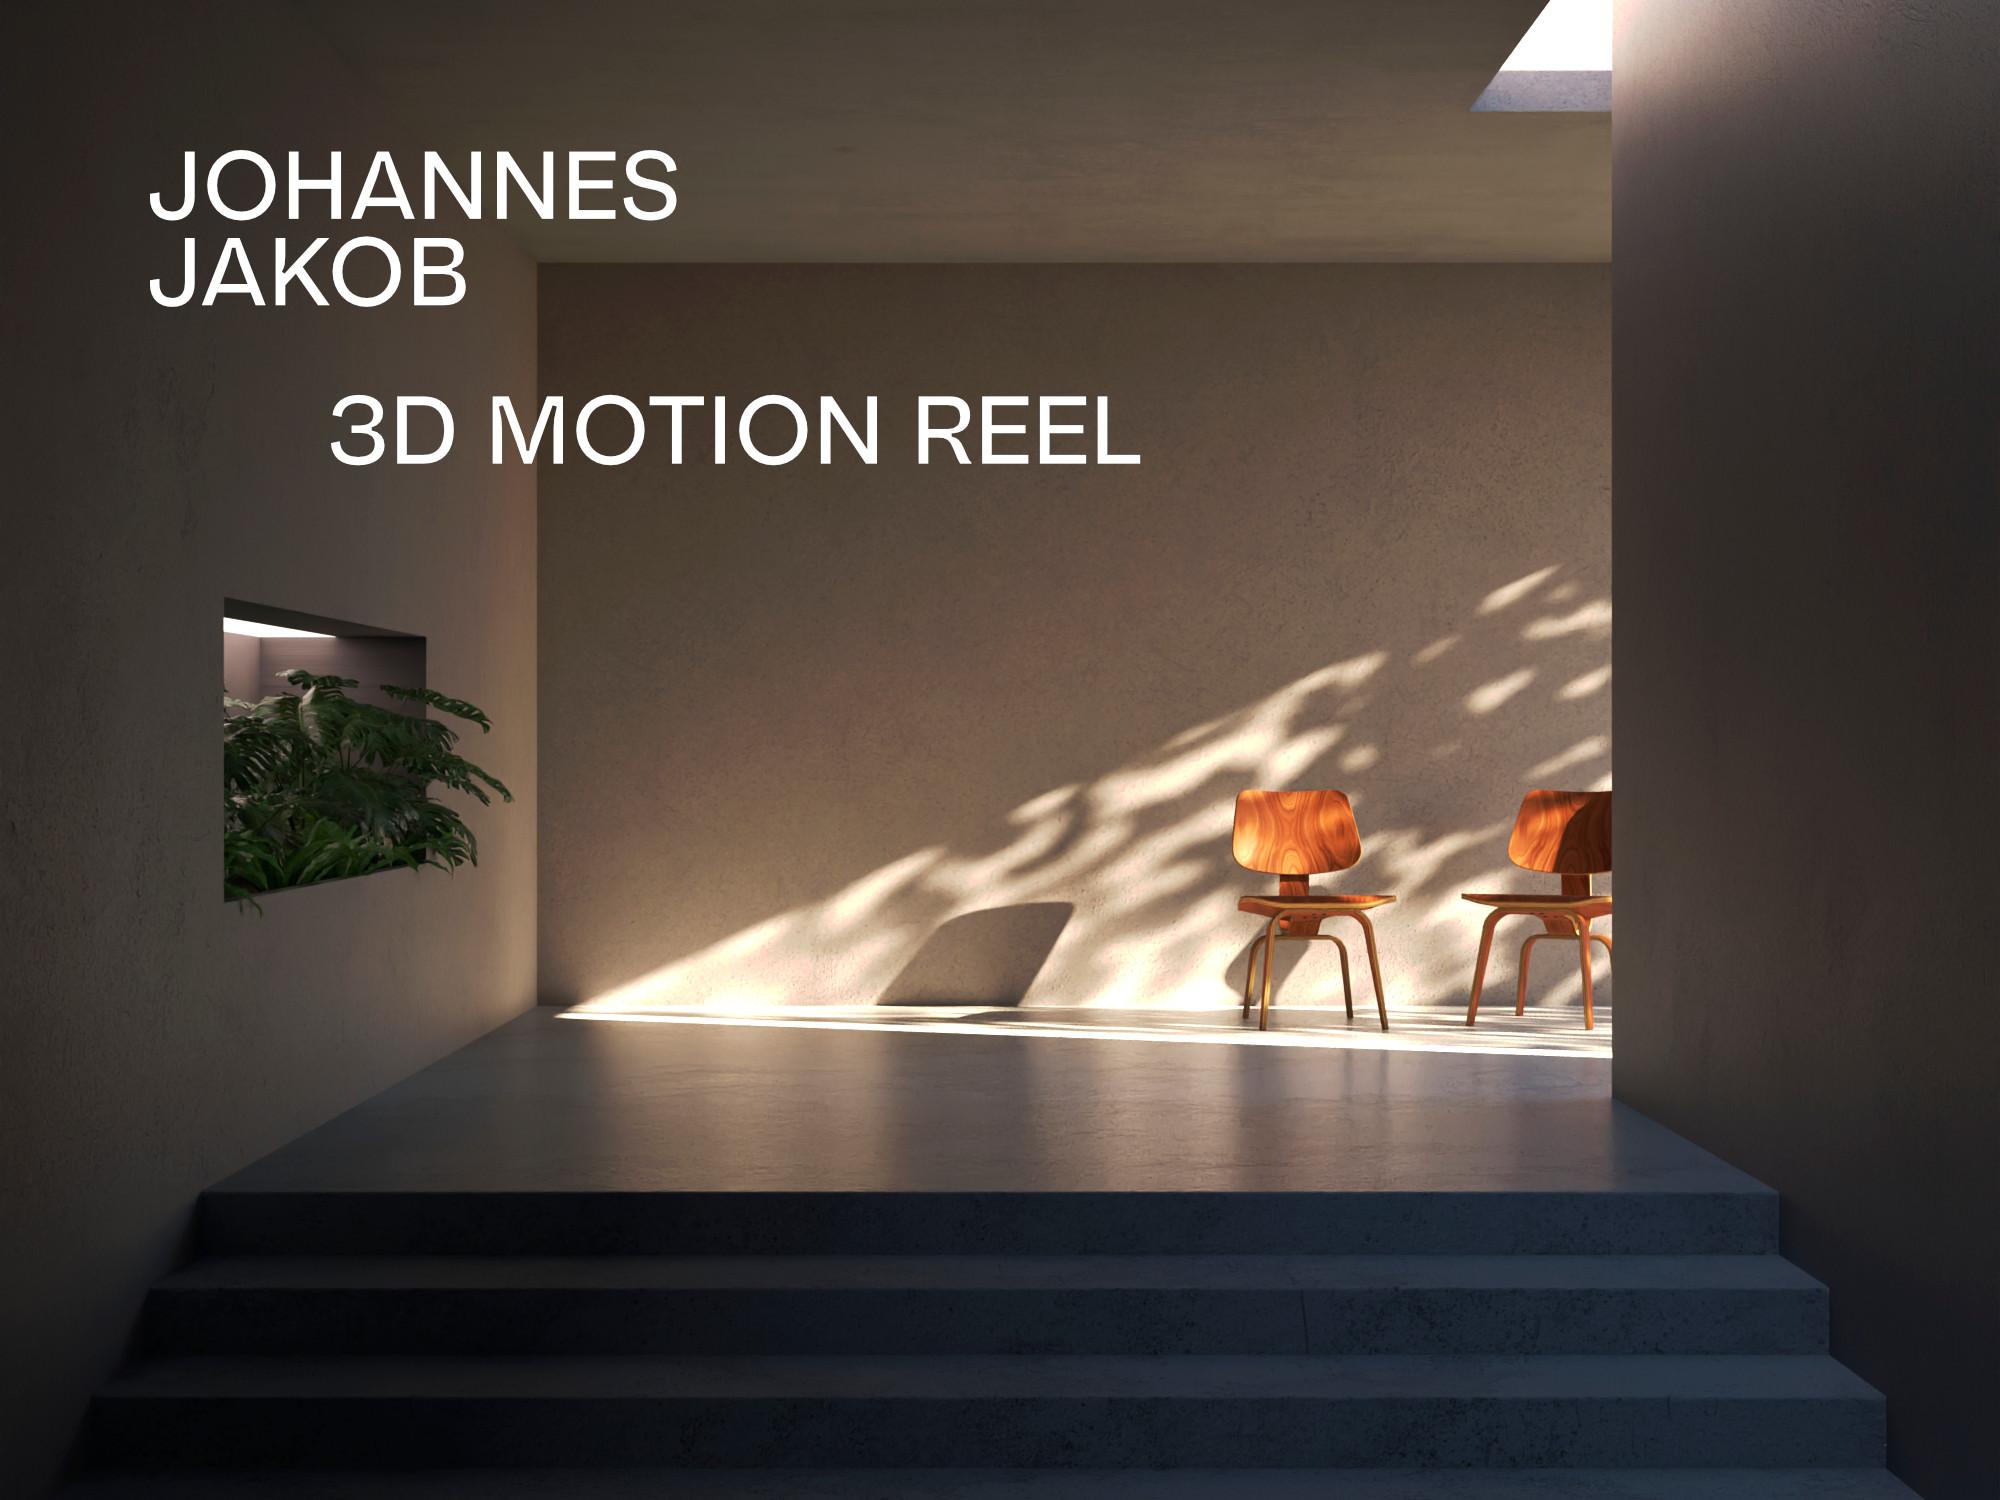 3D Motion Reel